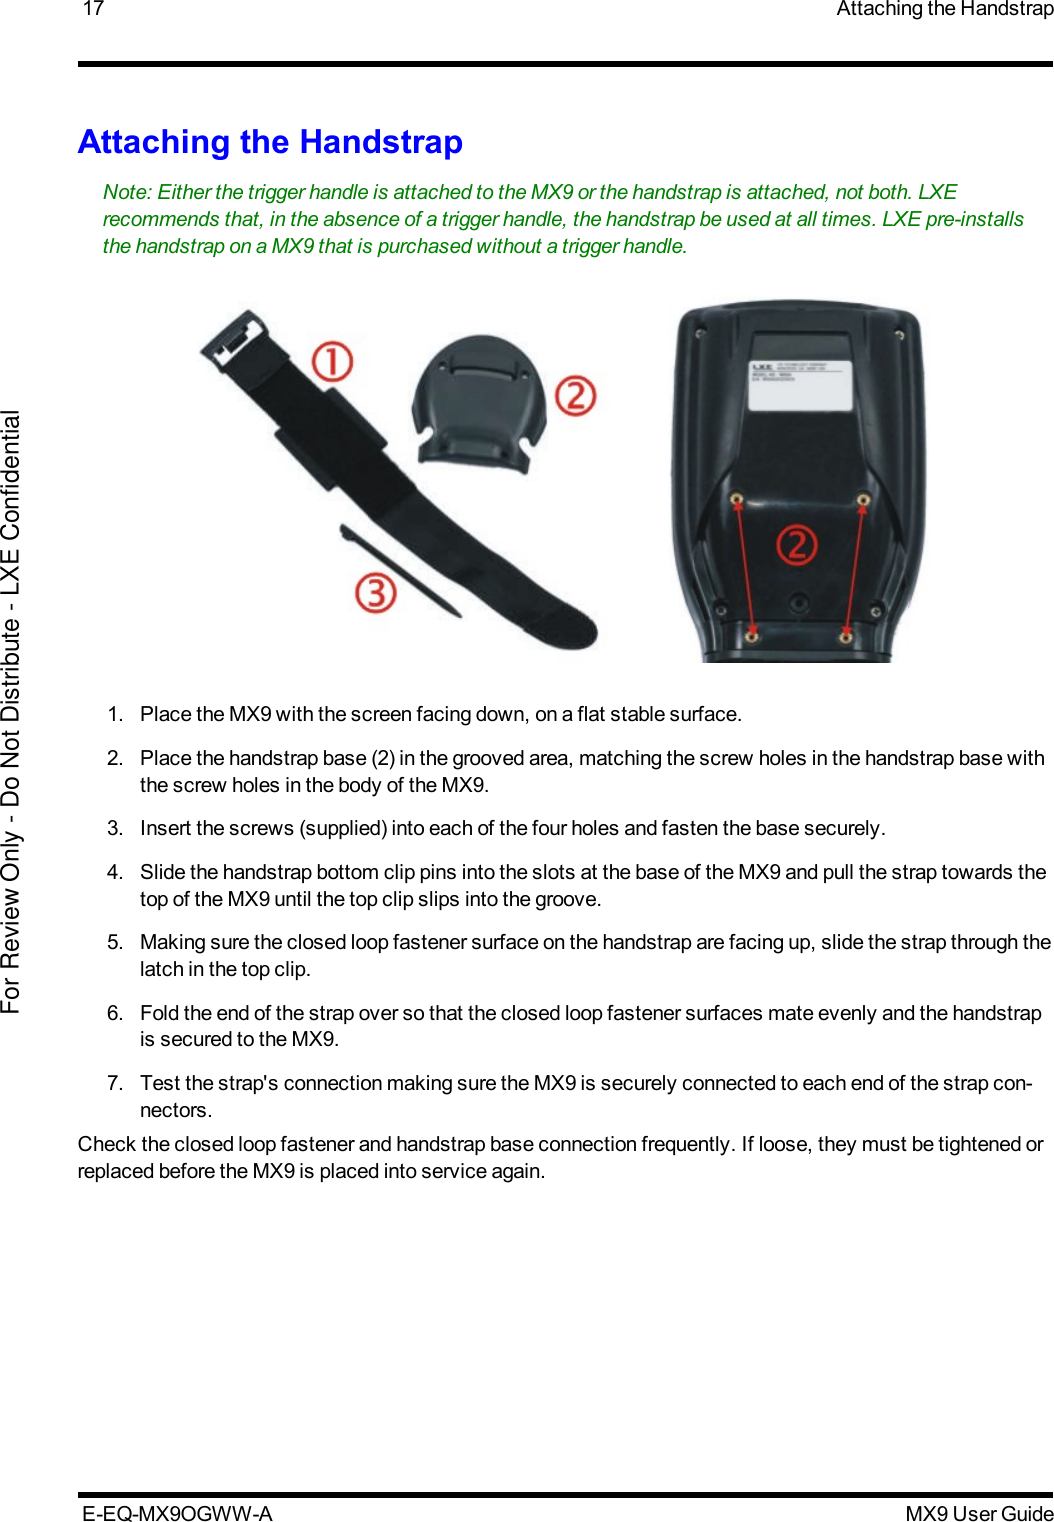 microsoft outlook user guide pdf